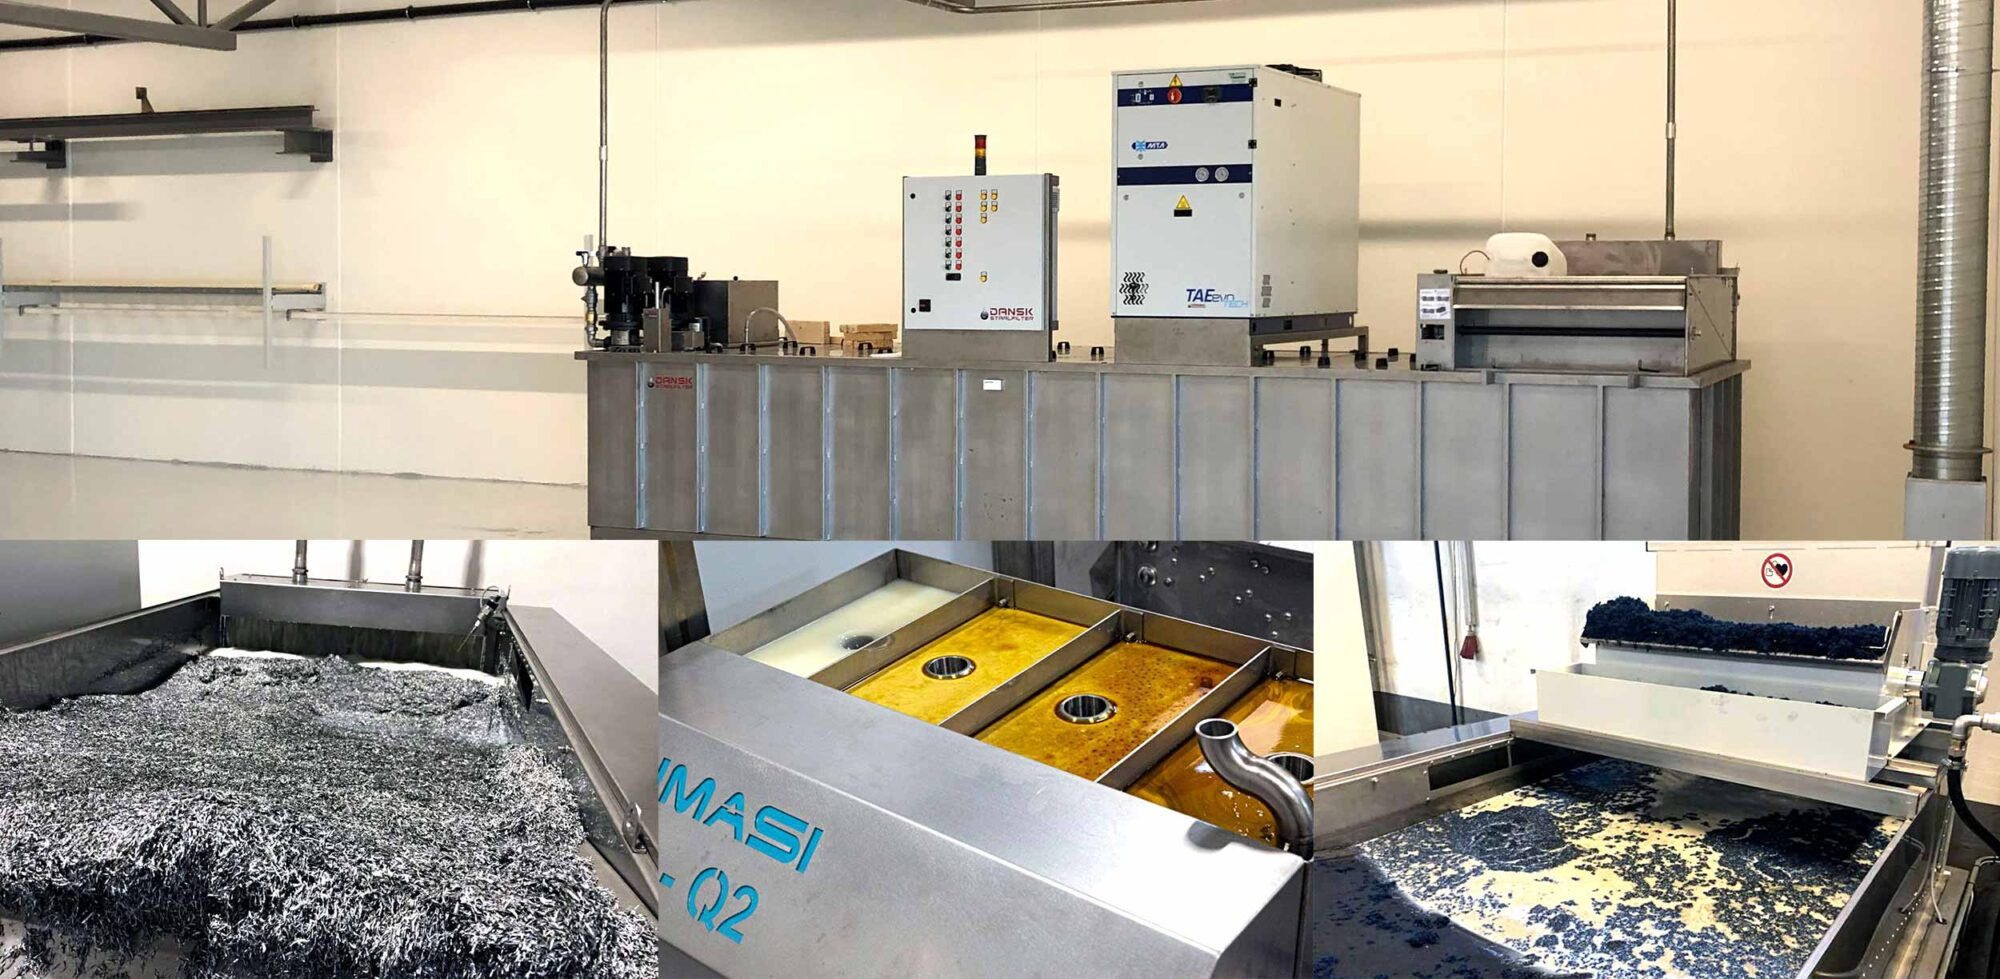 Sistem centralizat filtrare emulsie ulei apa proces